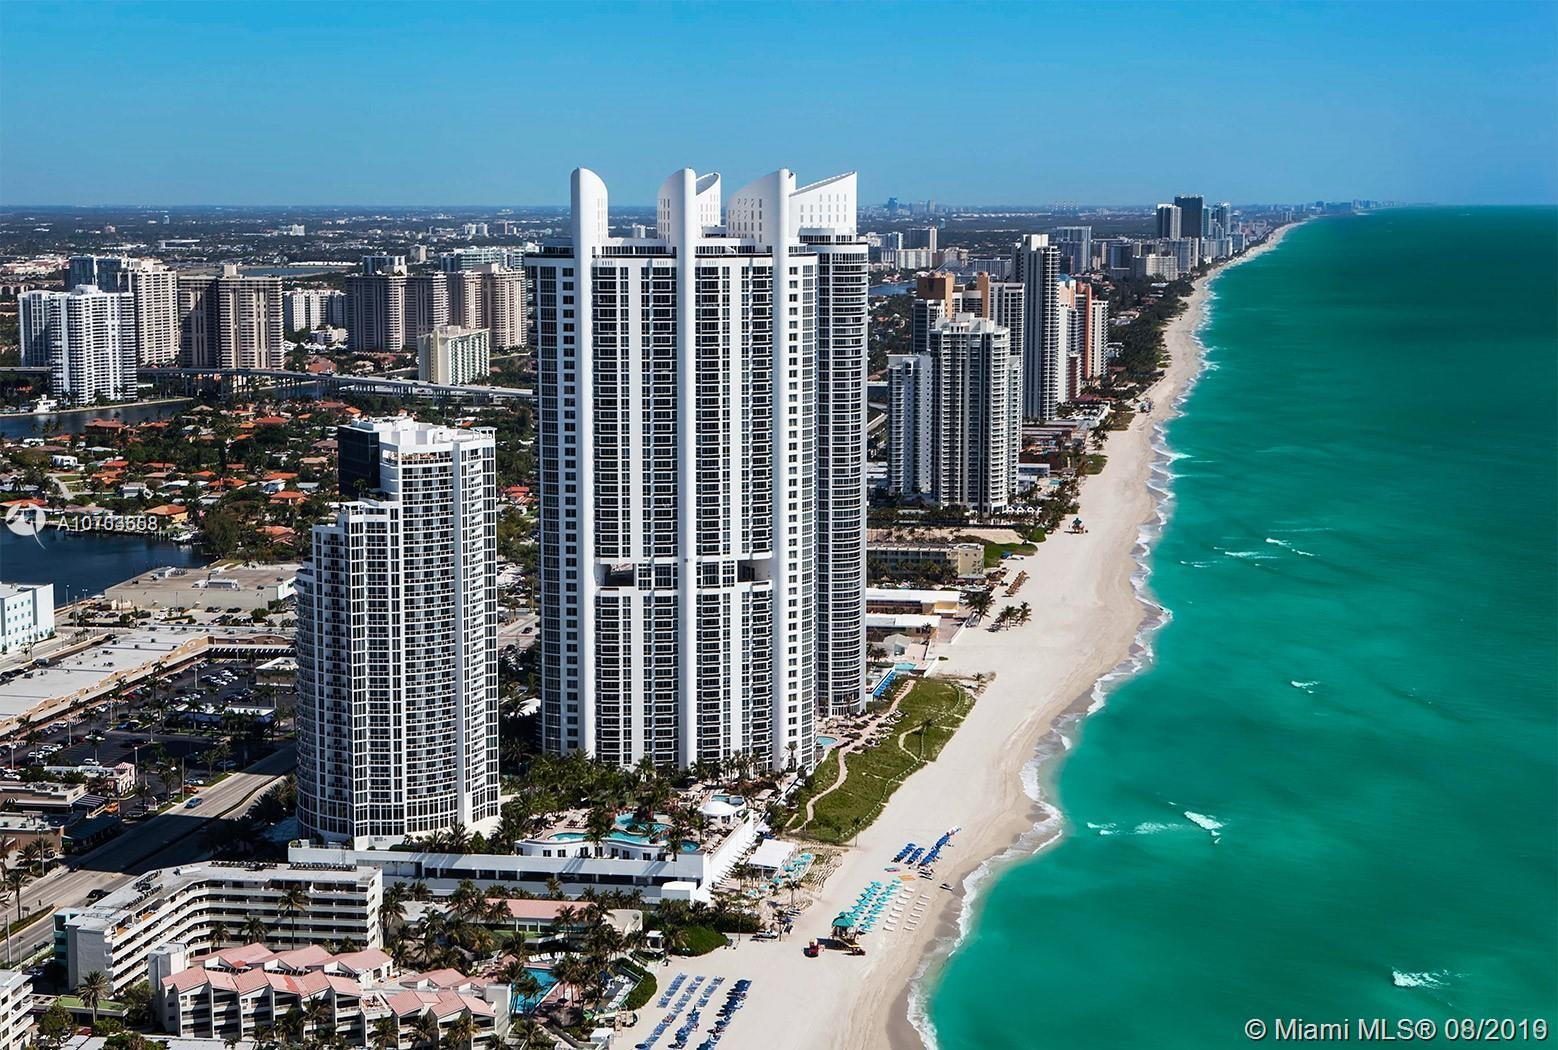 Trump International #2414/2415 - 18001 Collins Ave #2414/2415, Sunny Isles Beach, FL 33160